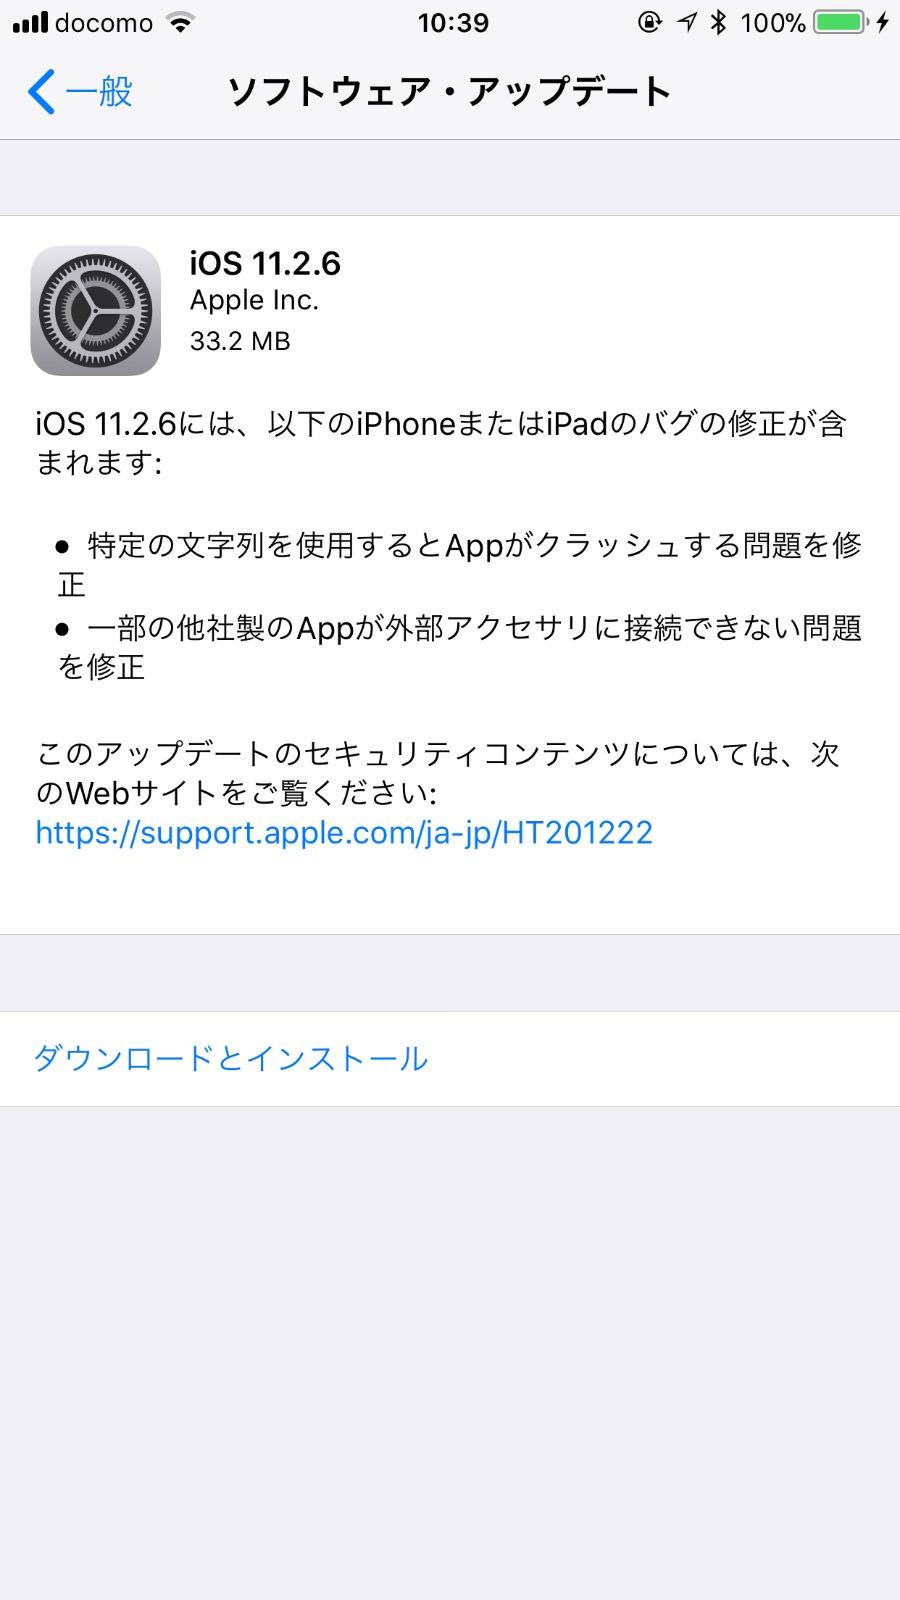 【iOS 11】「iOS 11.2.6 ソフトウェアアップデート」リリース 〜特定の文字列でクラッシュする問題を解消